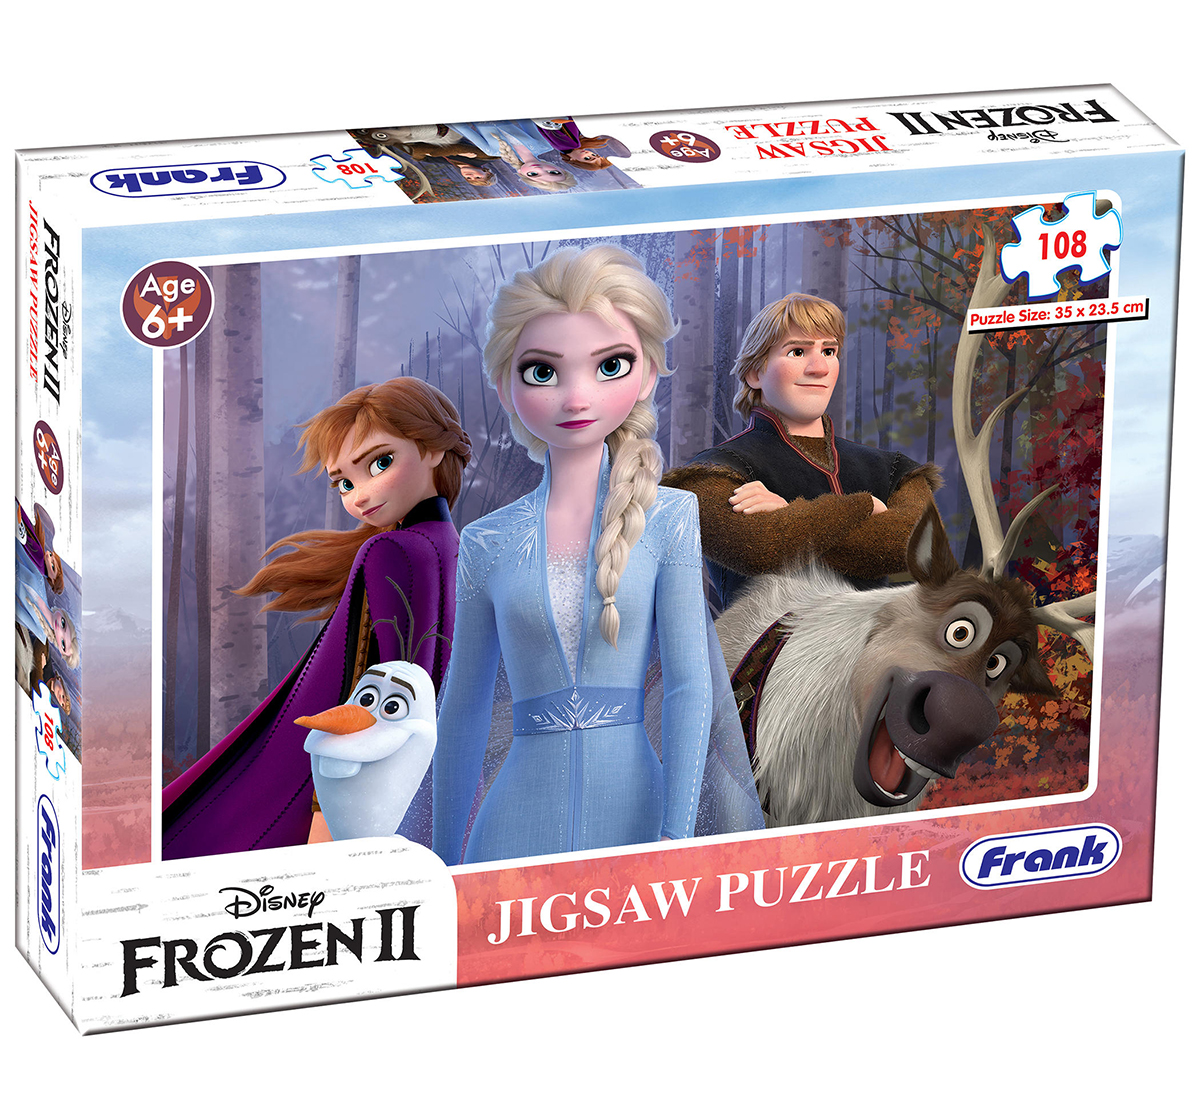 Frank | Frank Frozen II 108 Pcs Puzzle for Kids age 6Y+